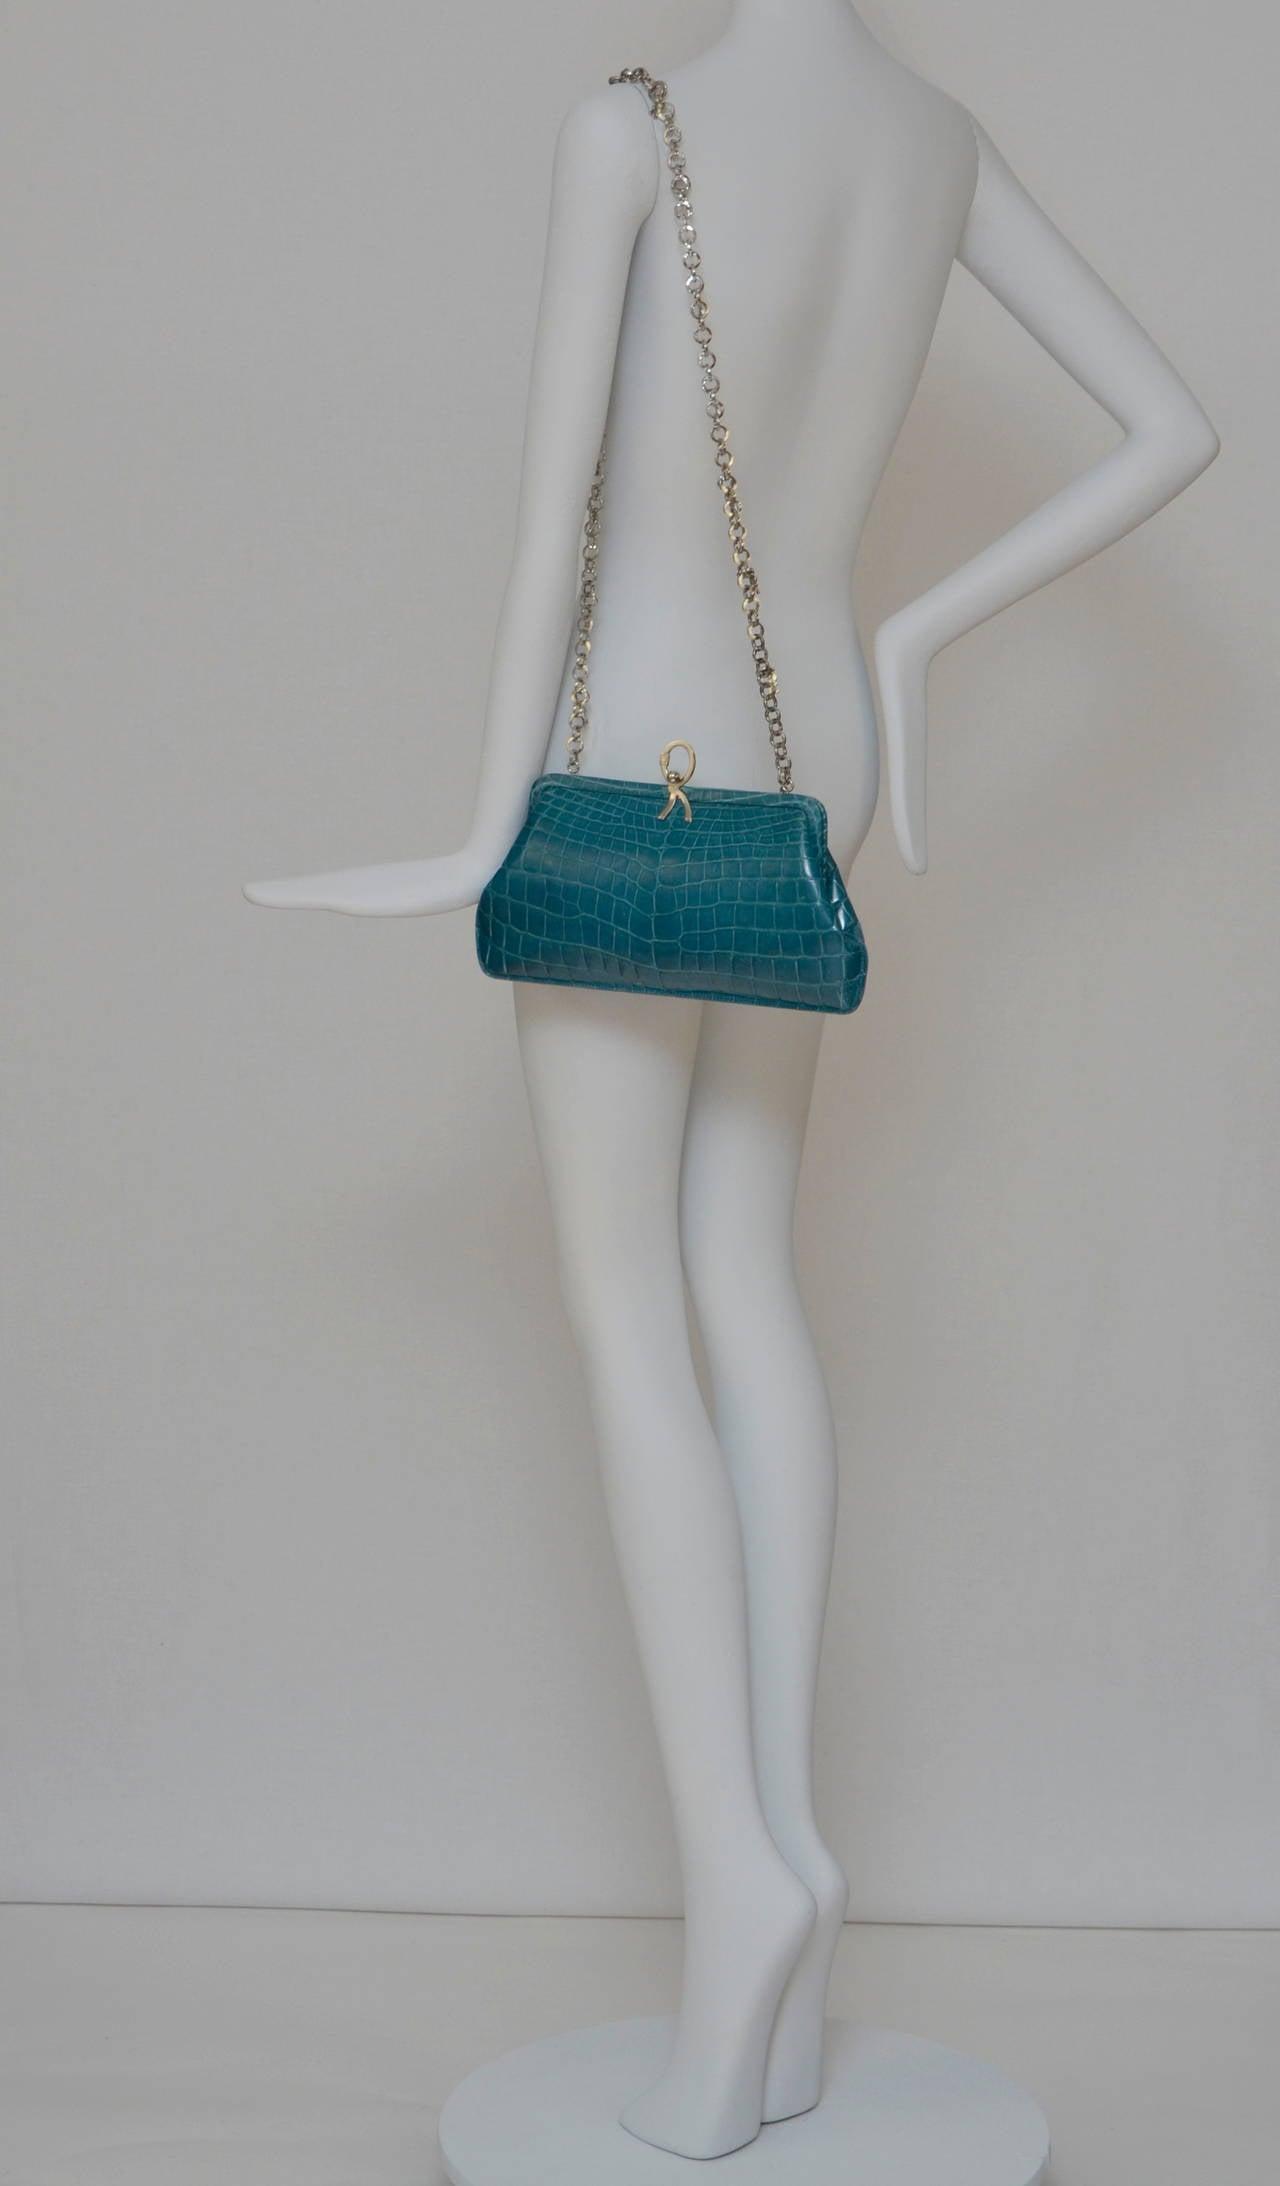 ROBERTA DI CAMERINO Crocodile Clutch Handbag Mint 10